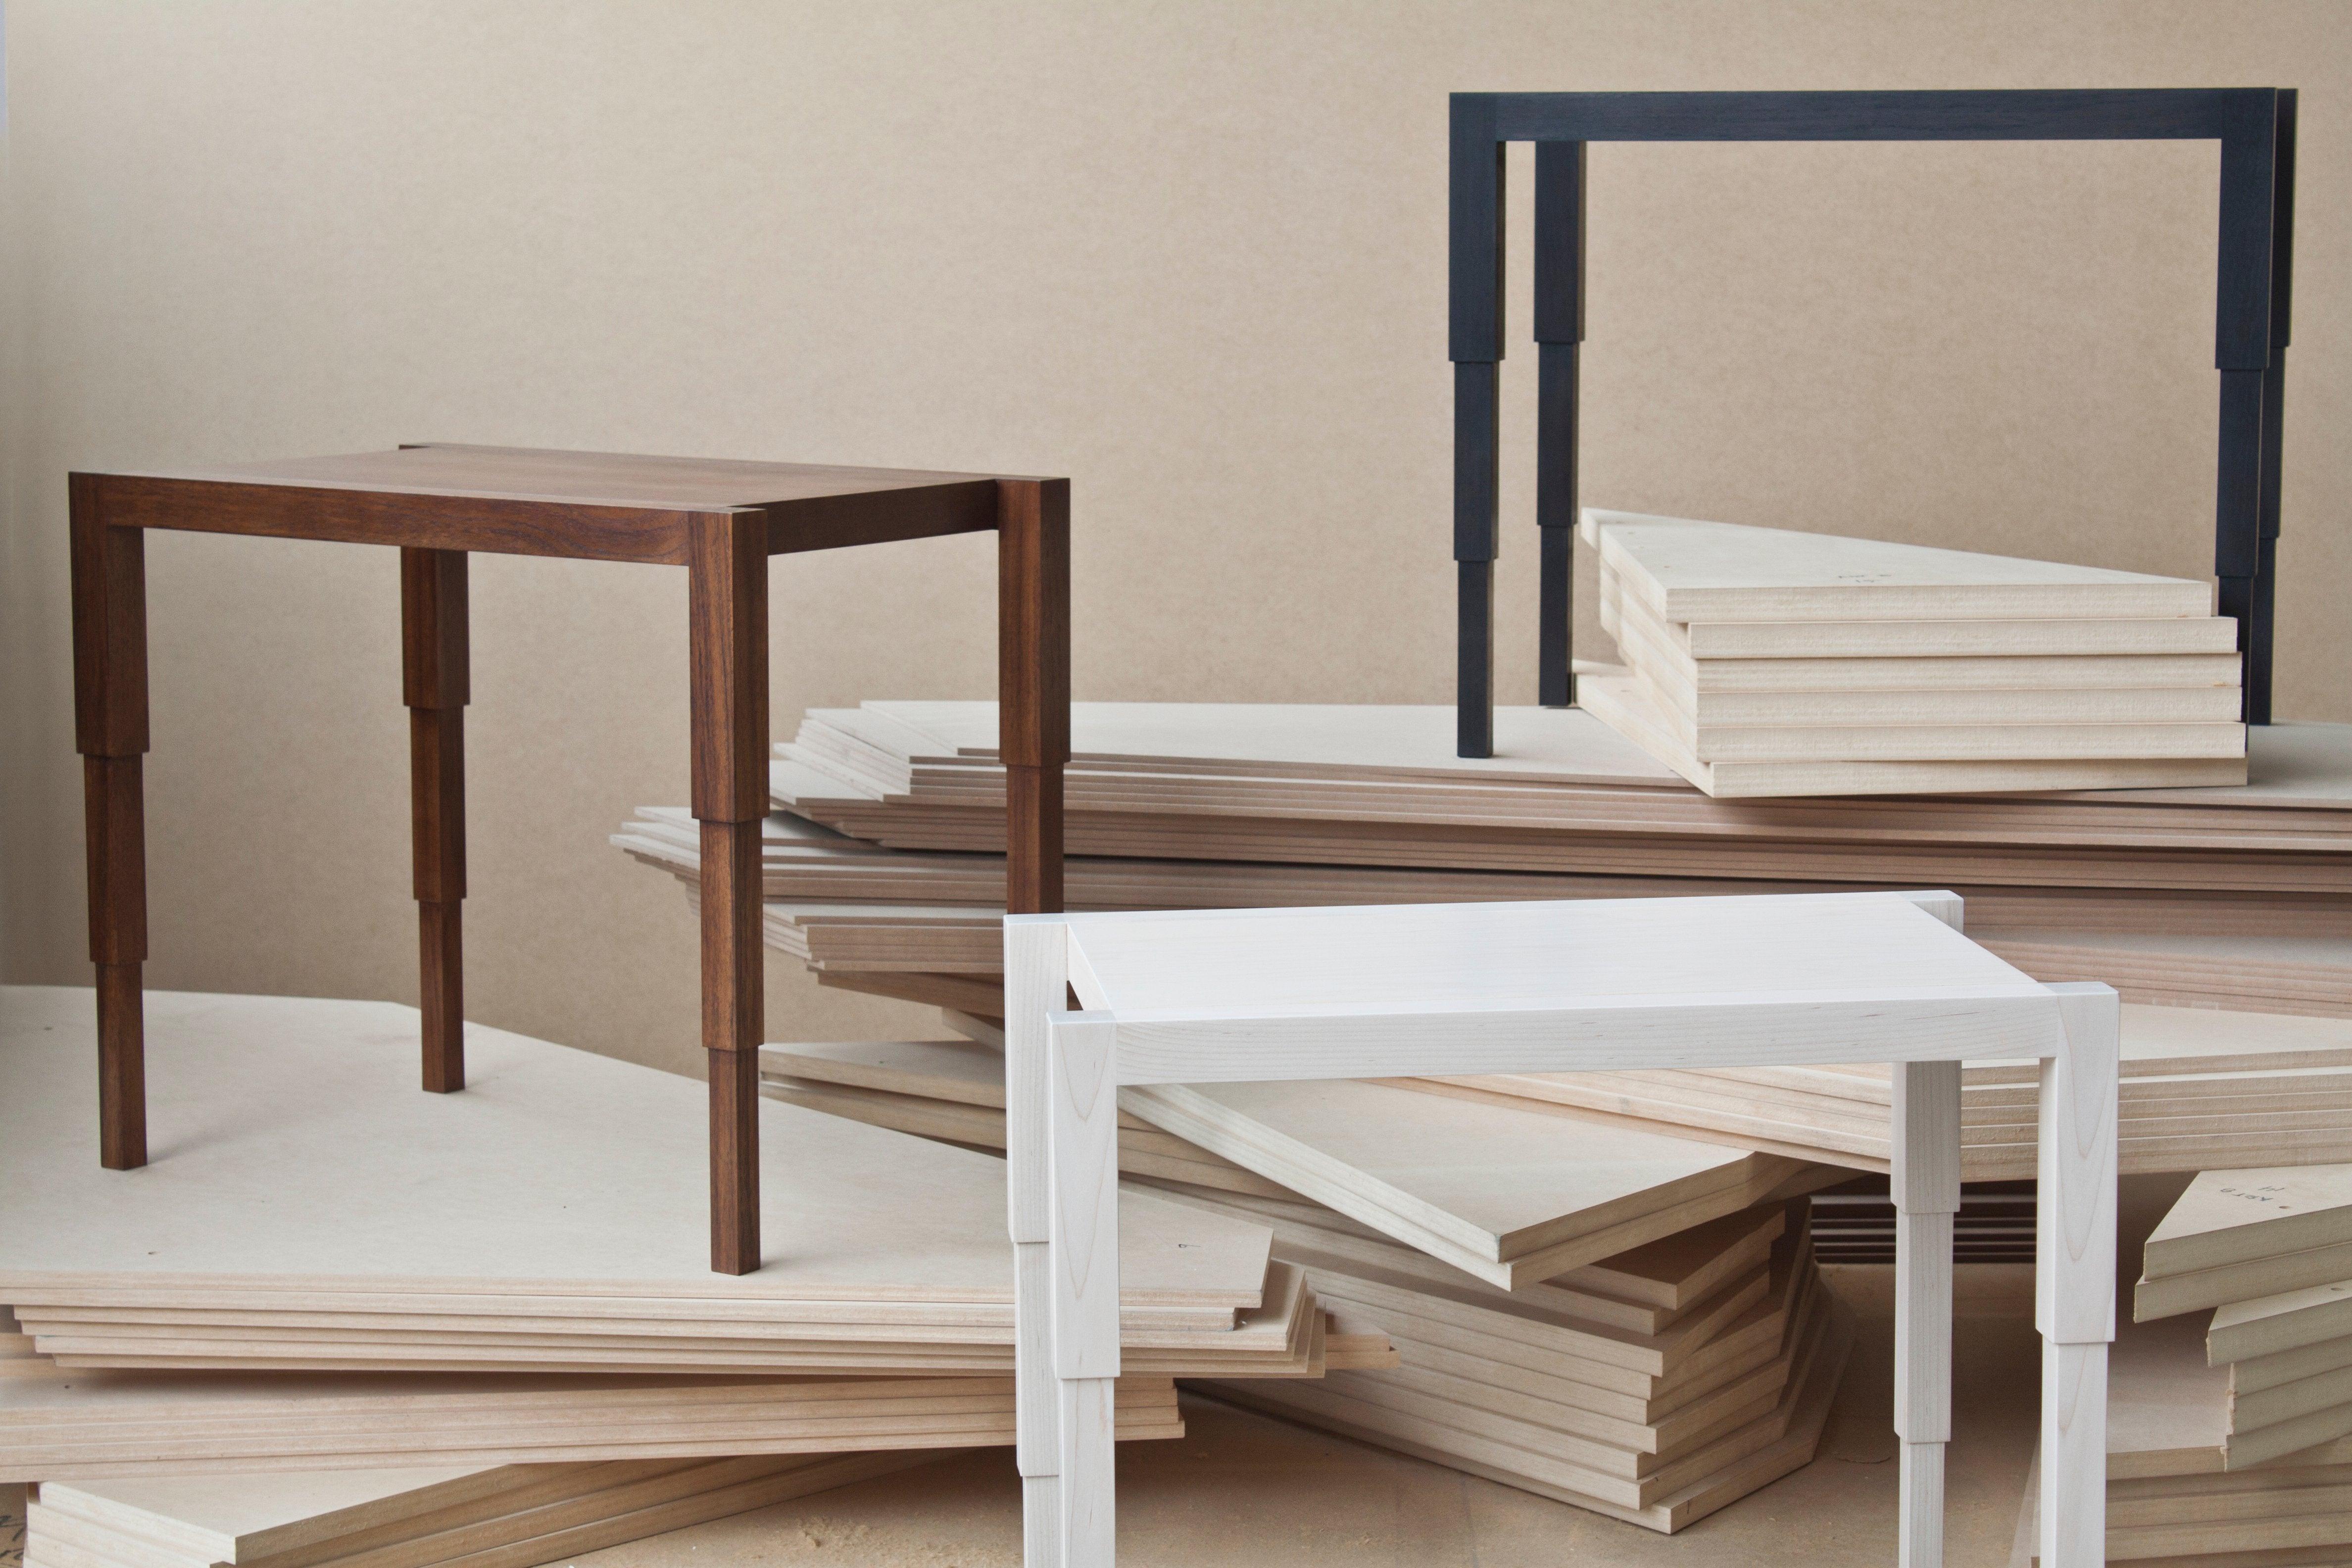 May furniture 1stdibs for Design furniture chicago